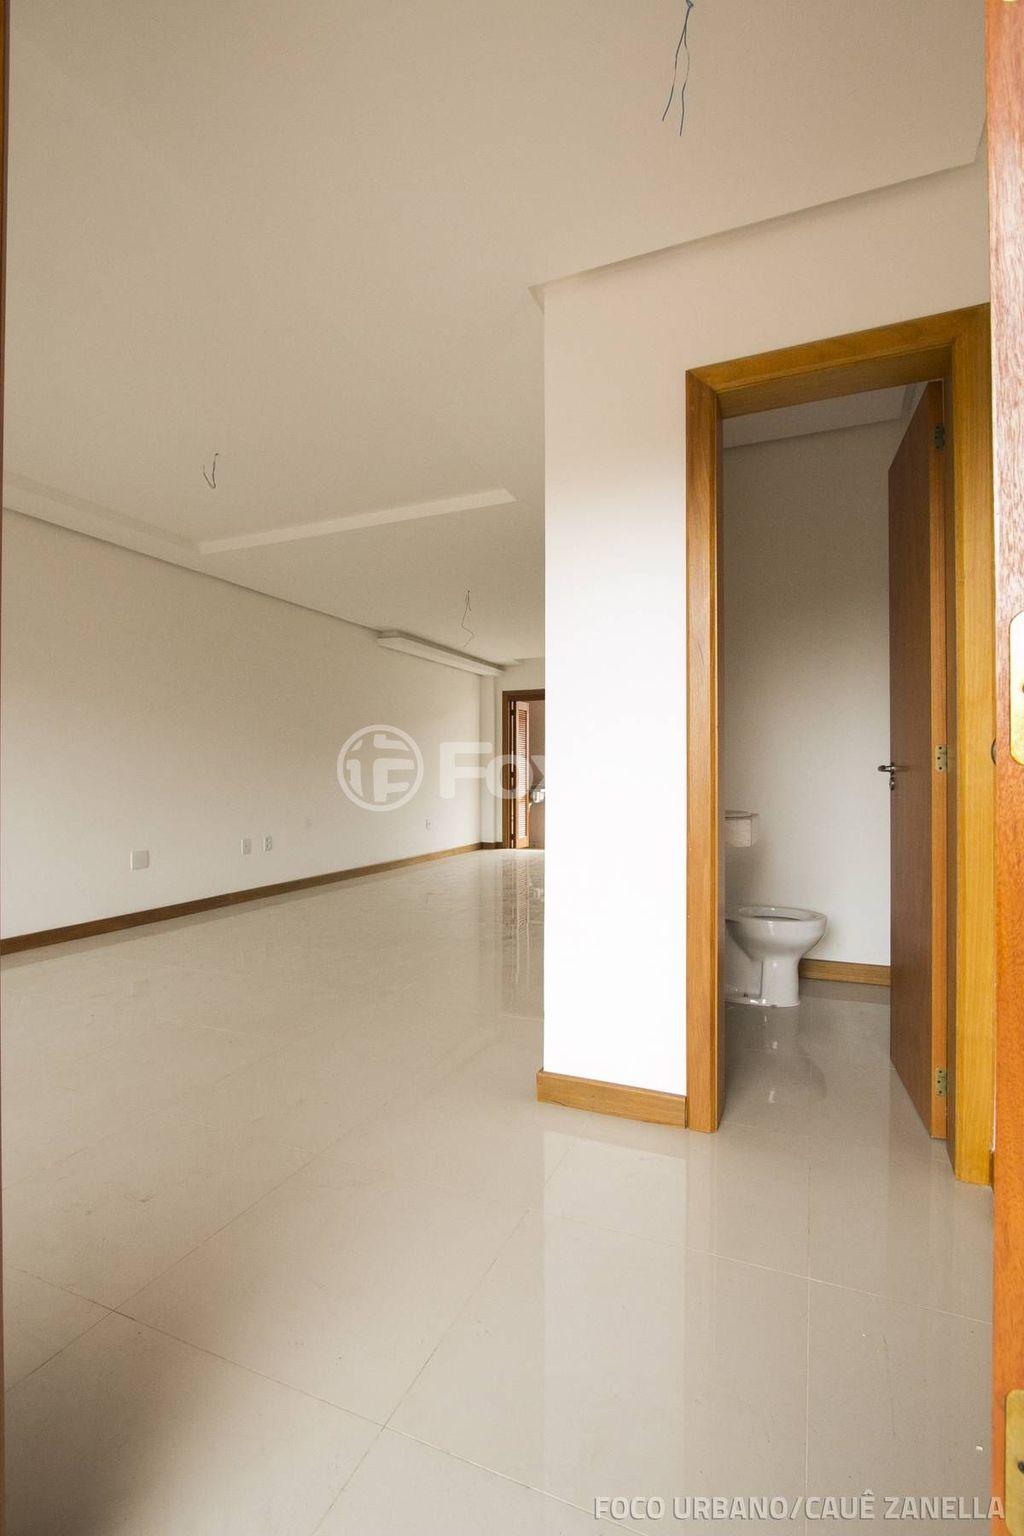 Casa 3 Dorm, Espírito Santo, Porto Alegre (118825) - Foto 3